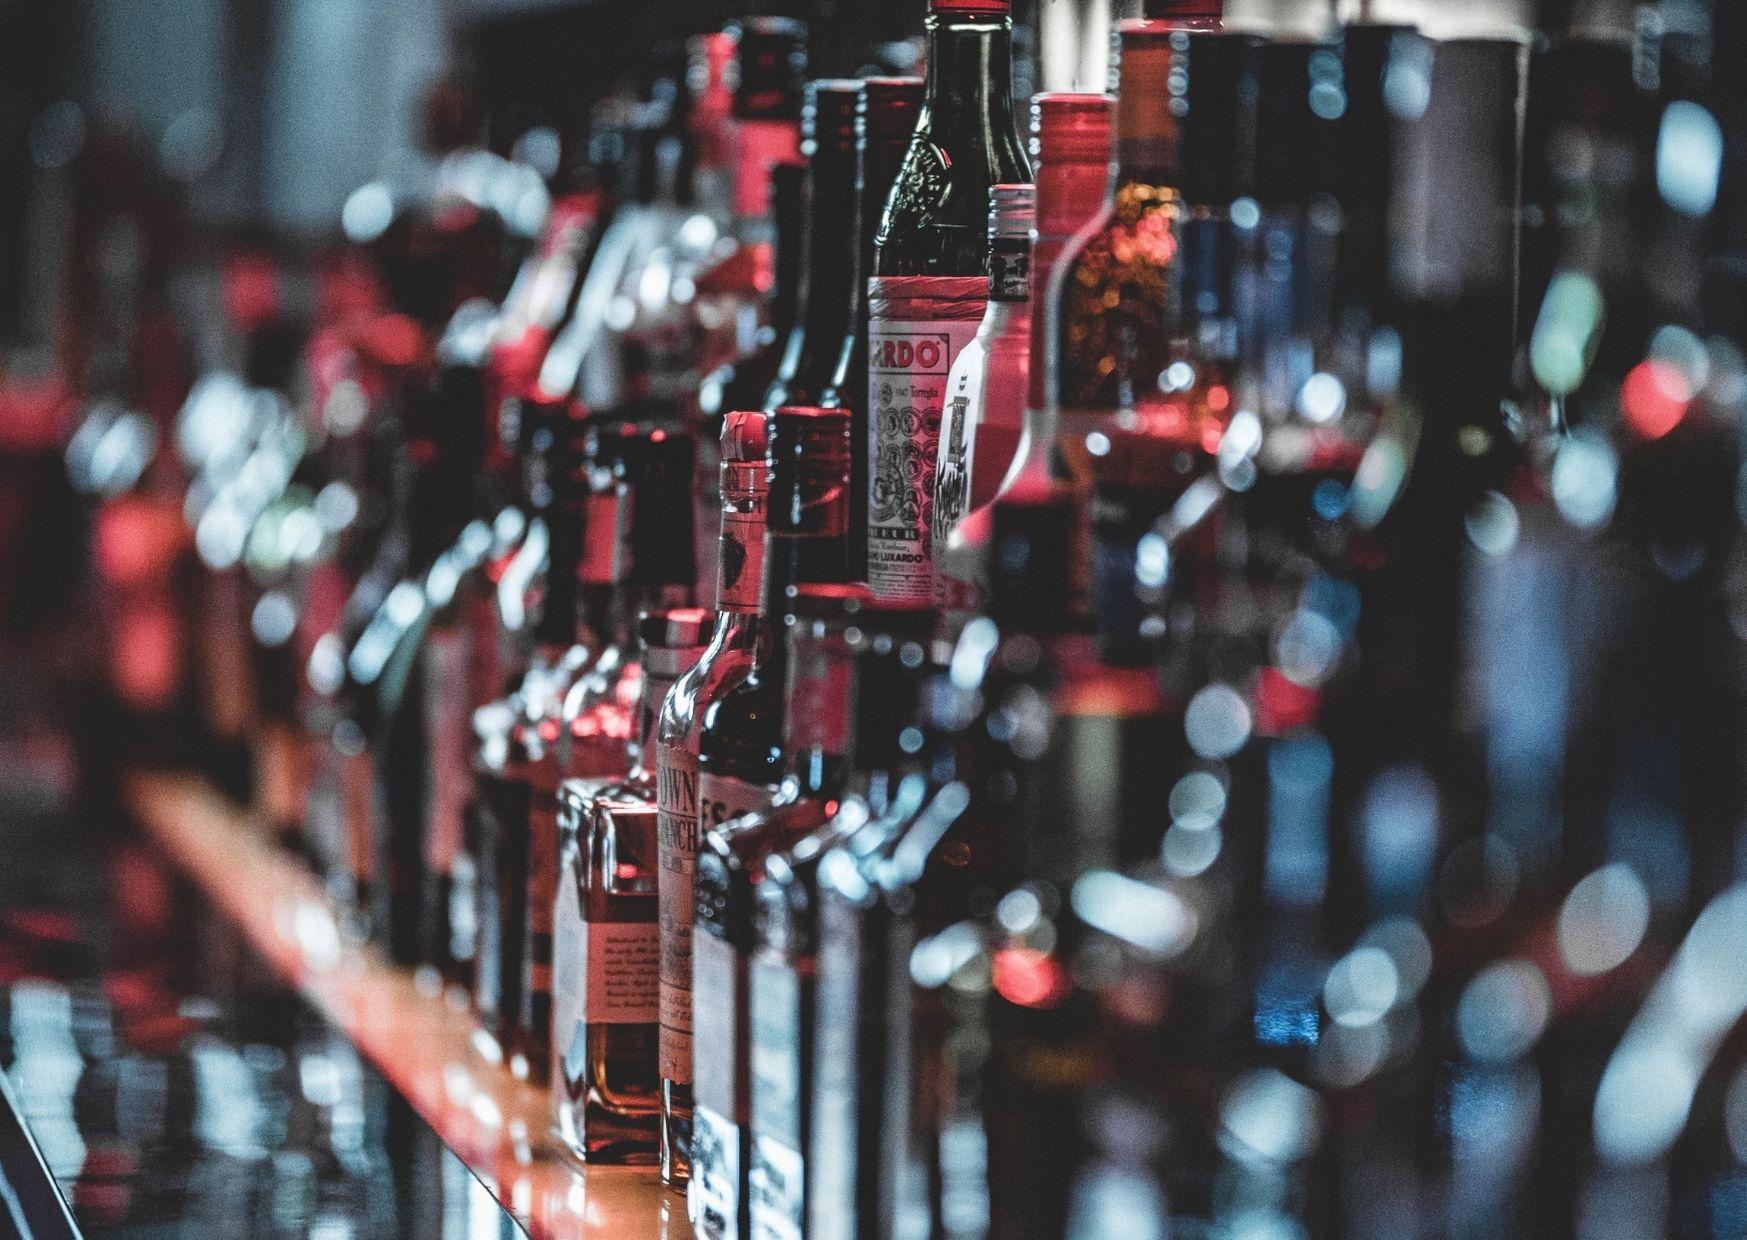 butelki z alkoholem